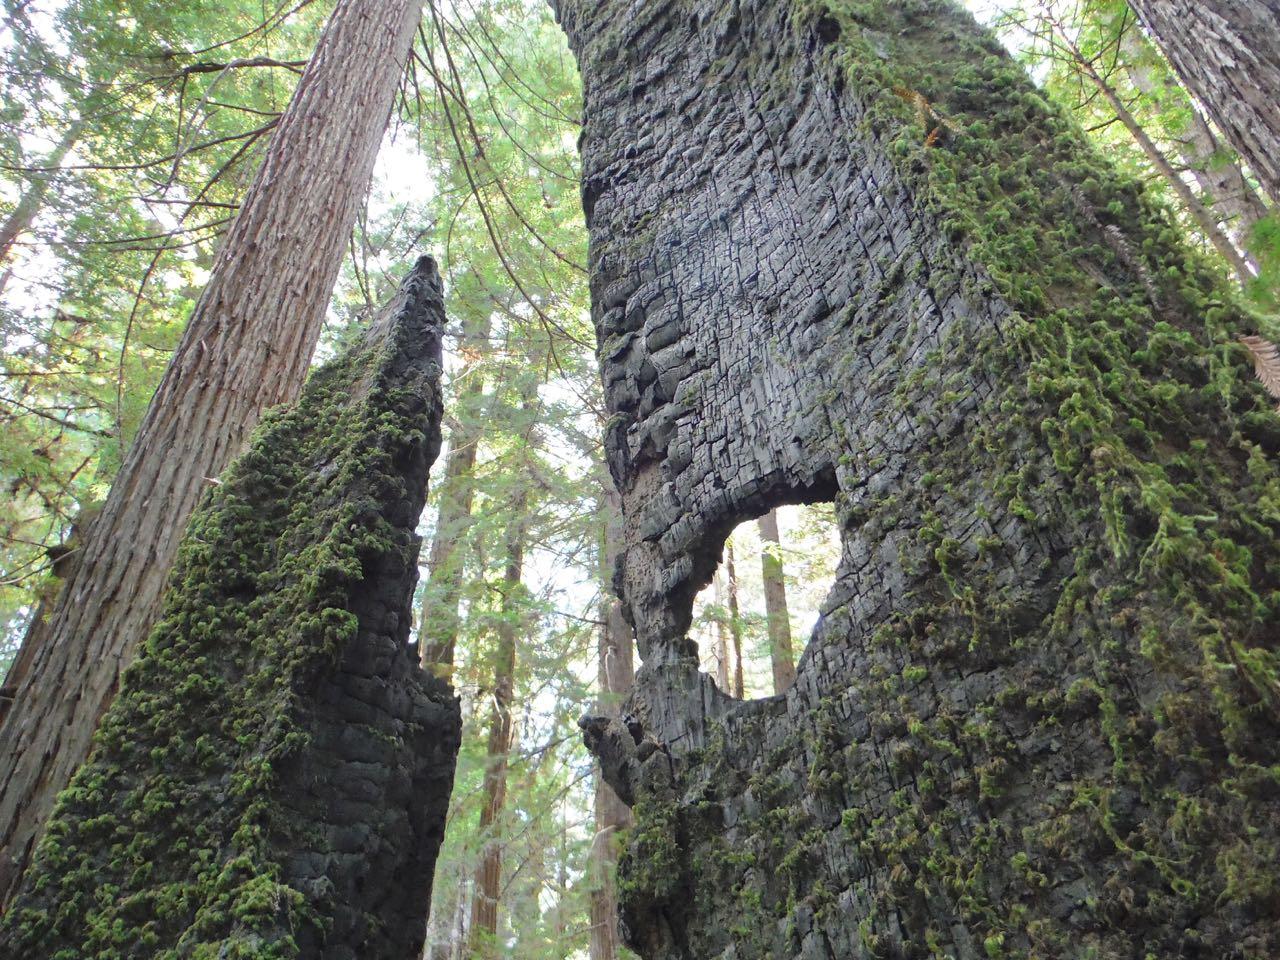 Redwoods 2017 10 08 54 Of 287